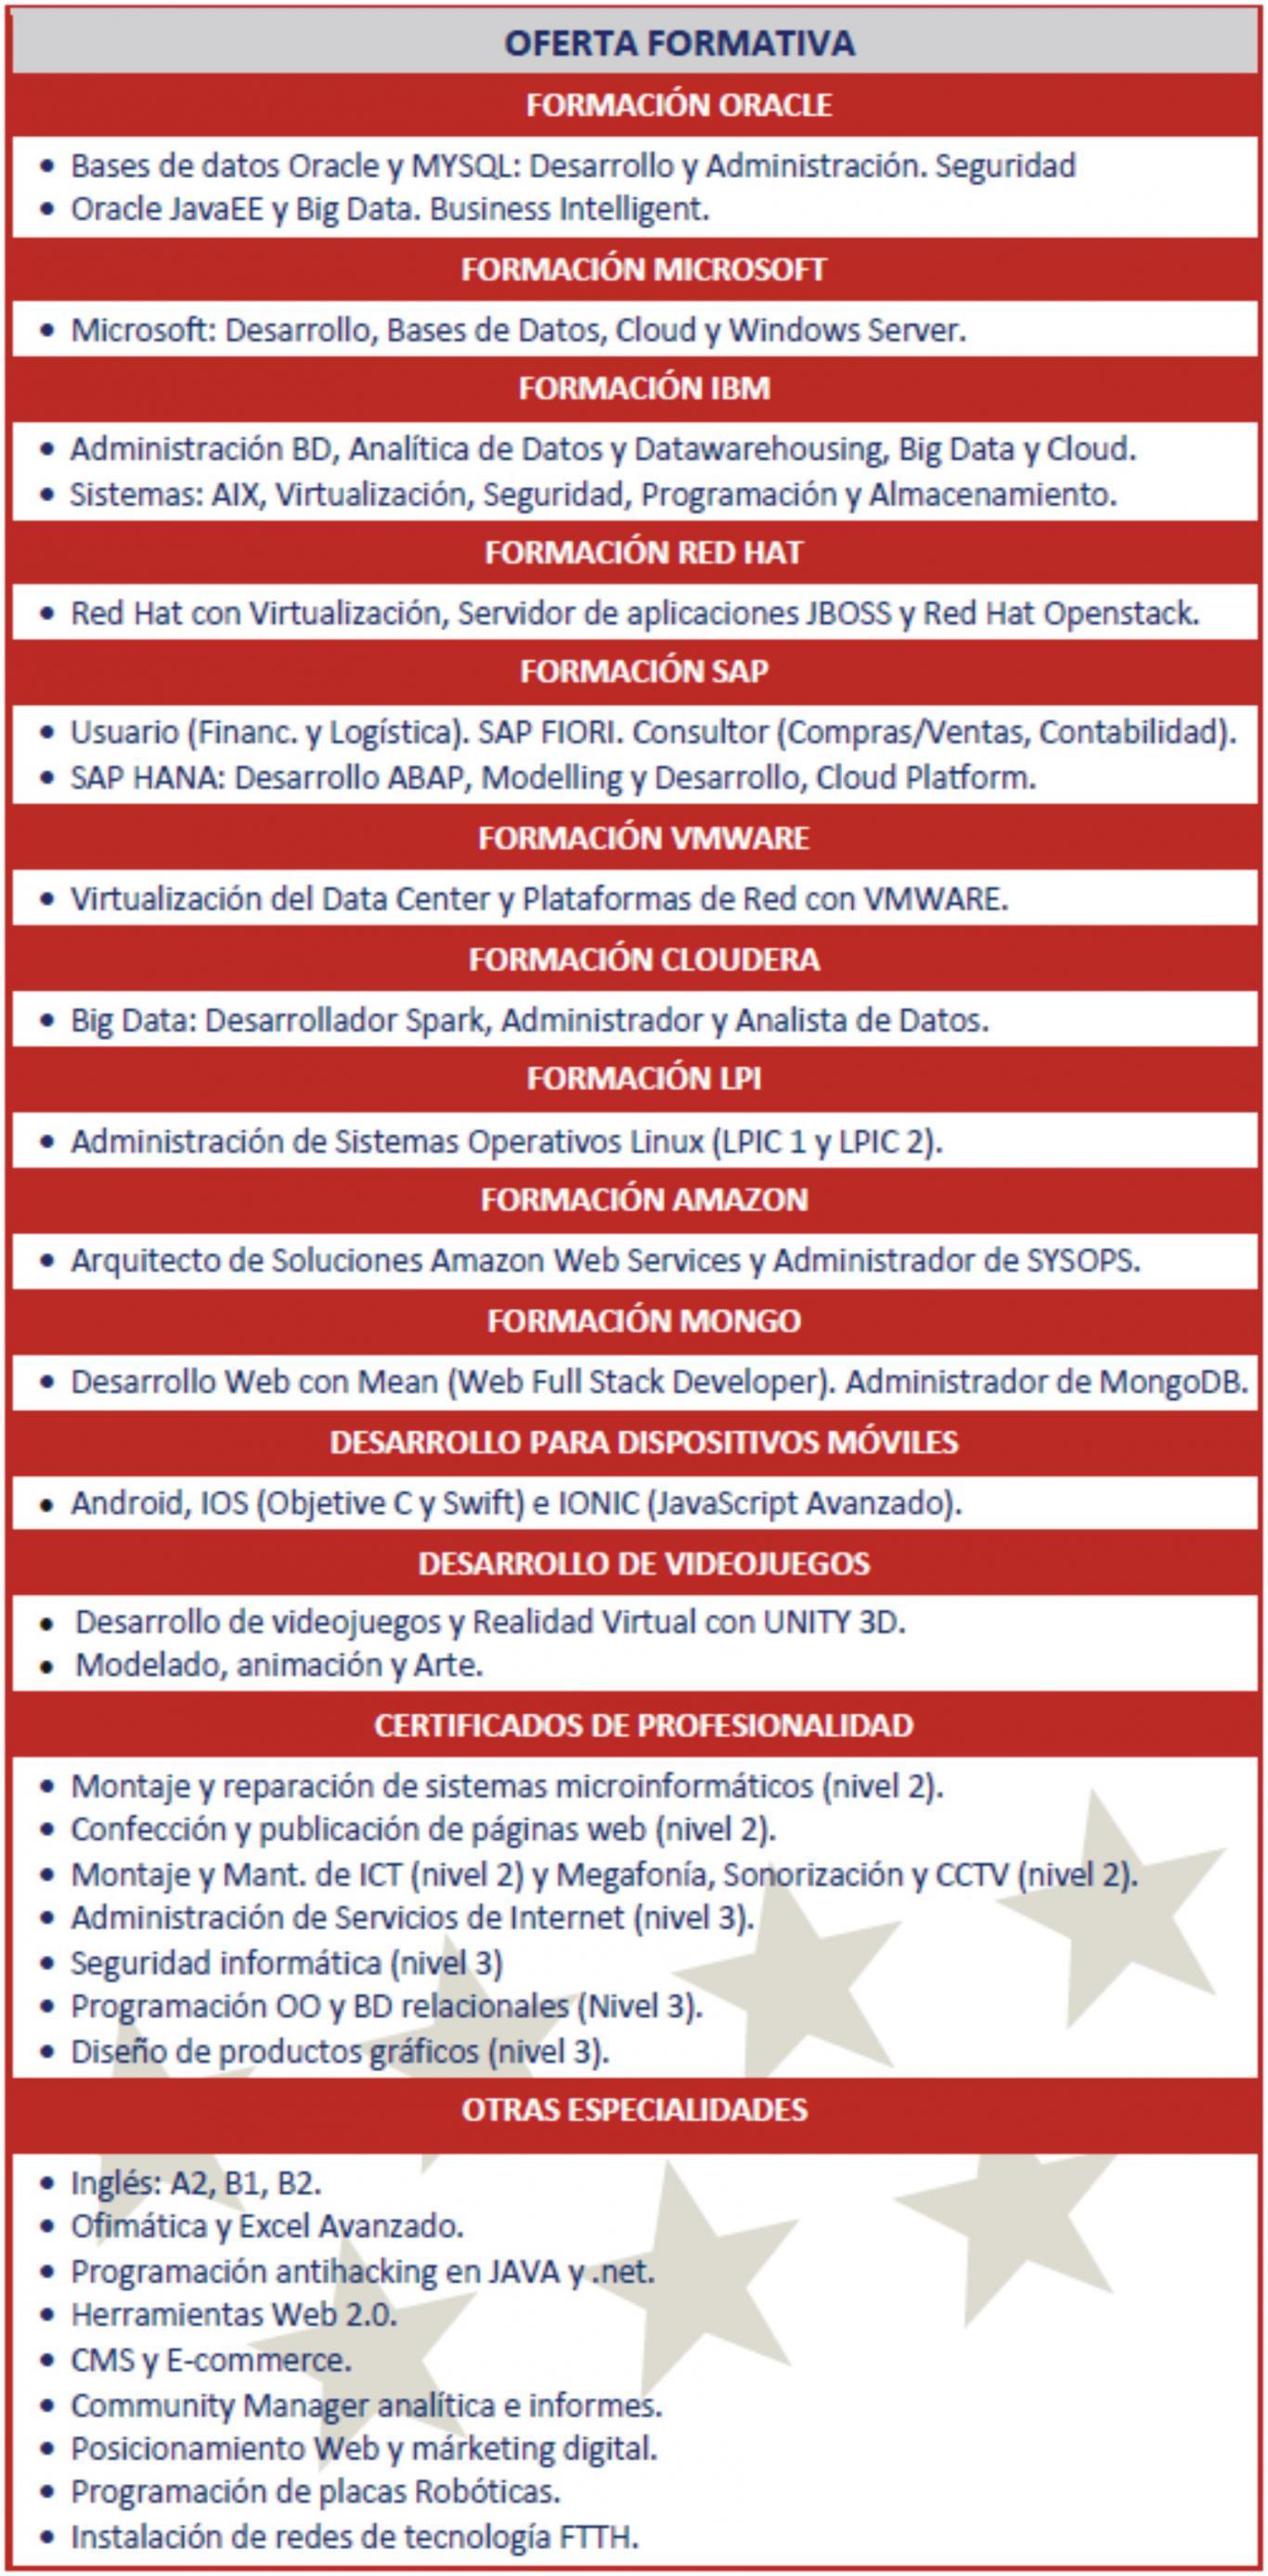 Oferta formativa CRN Getafe